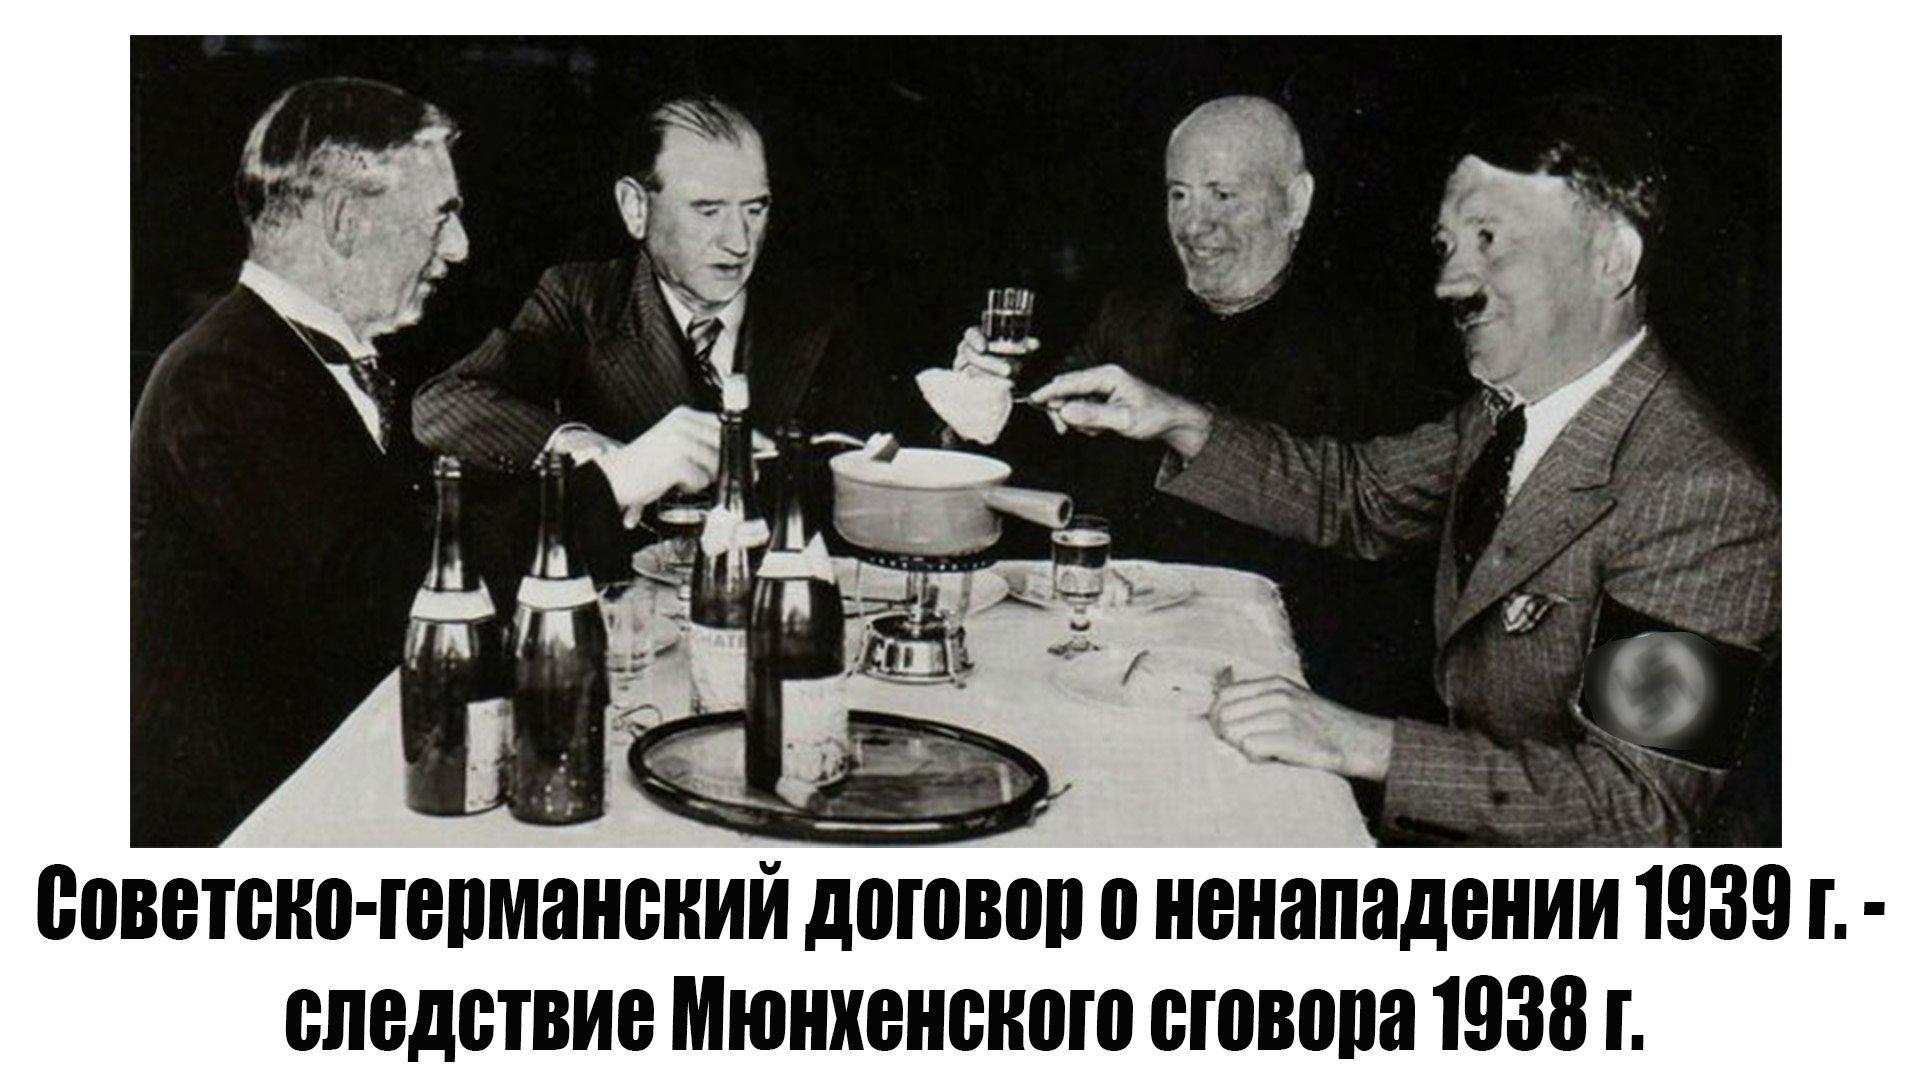 "تويتر \ МИД России 🇷🇺 على تويتر: ""☝❗Советско-германский договор 1939 года  стал следствием Мюнхенского сговора 1938 года. Подробнее:  🔗https://t.co/jvV5v8OPVe #ВМВ #ВОВ #История #Память #СССР #Германия  #Италия #Франция #Англия #Польша #Чехословакия ..."